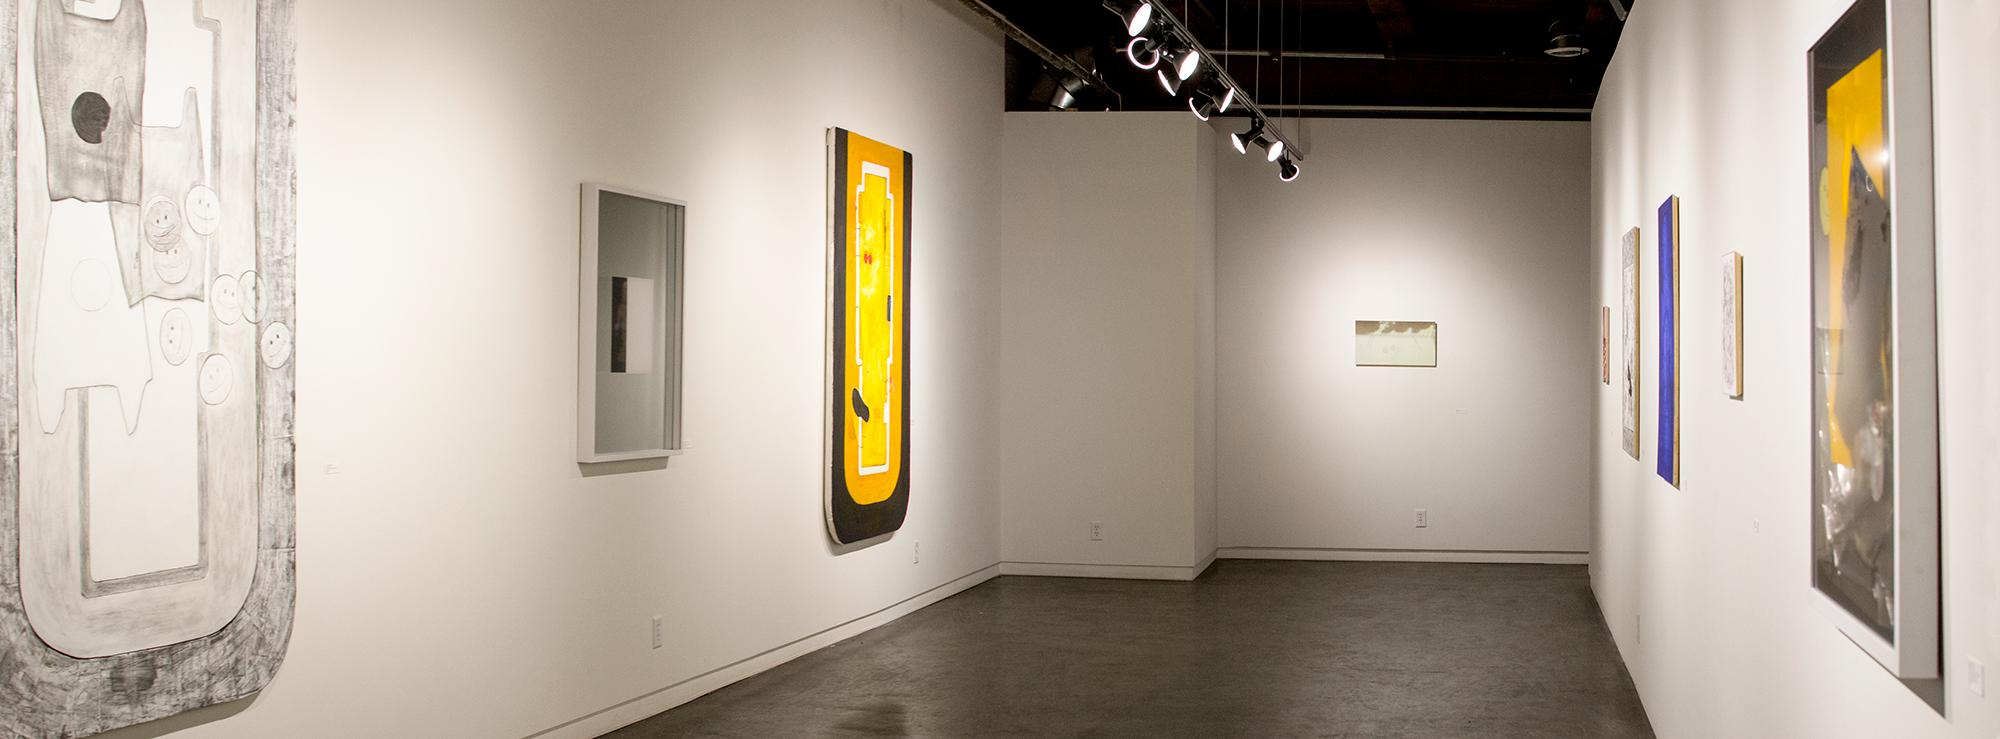 Soo Visual Arts Center - Matthew Yaeger